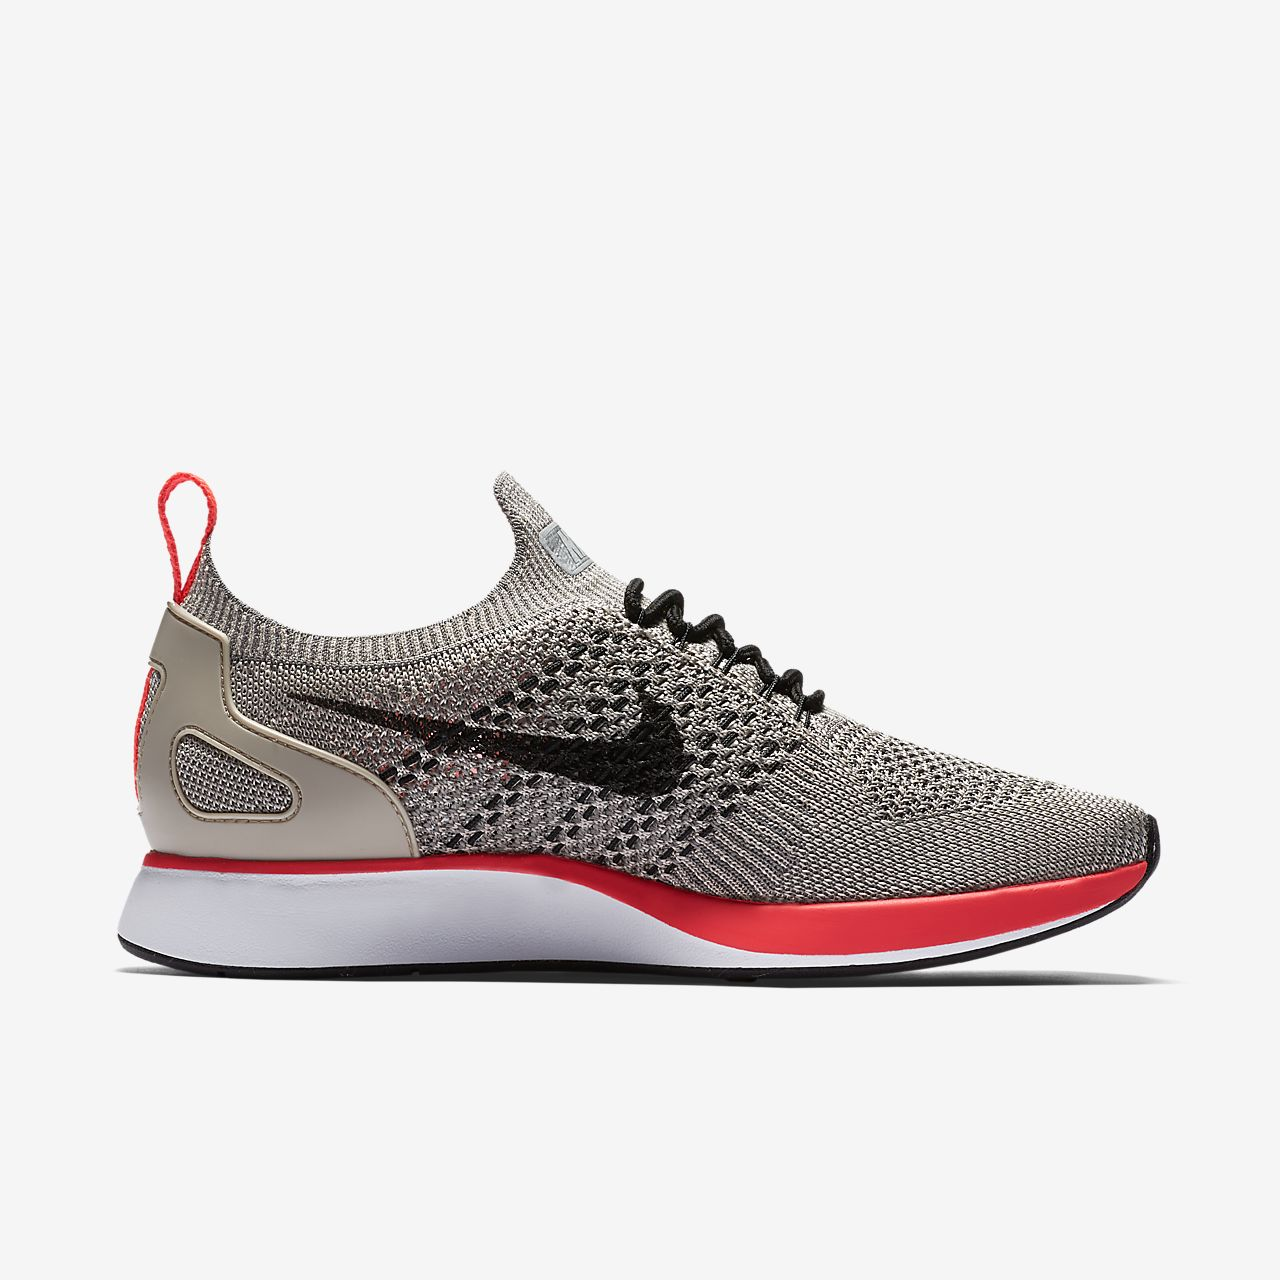 premium selection 59b88 91b42 ... sweden zapatillas nike air zoom mariah flyknit gris rojo mujer 36 5 gris  30skg2nkvd 10163 99365